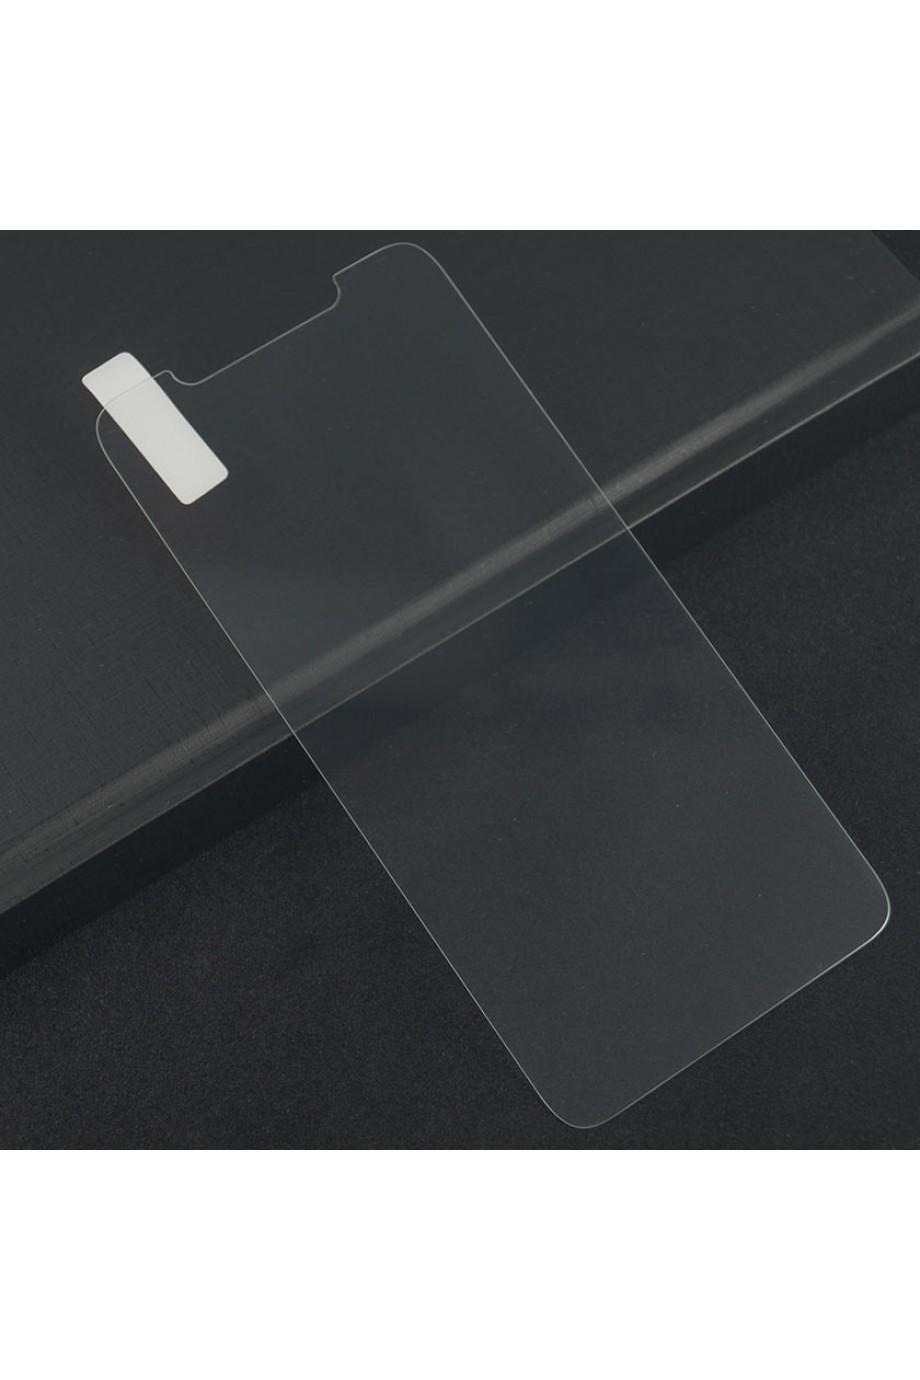 Защитное стекло Mocolo для iPhone XS Max